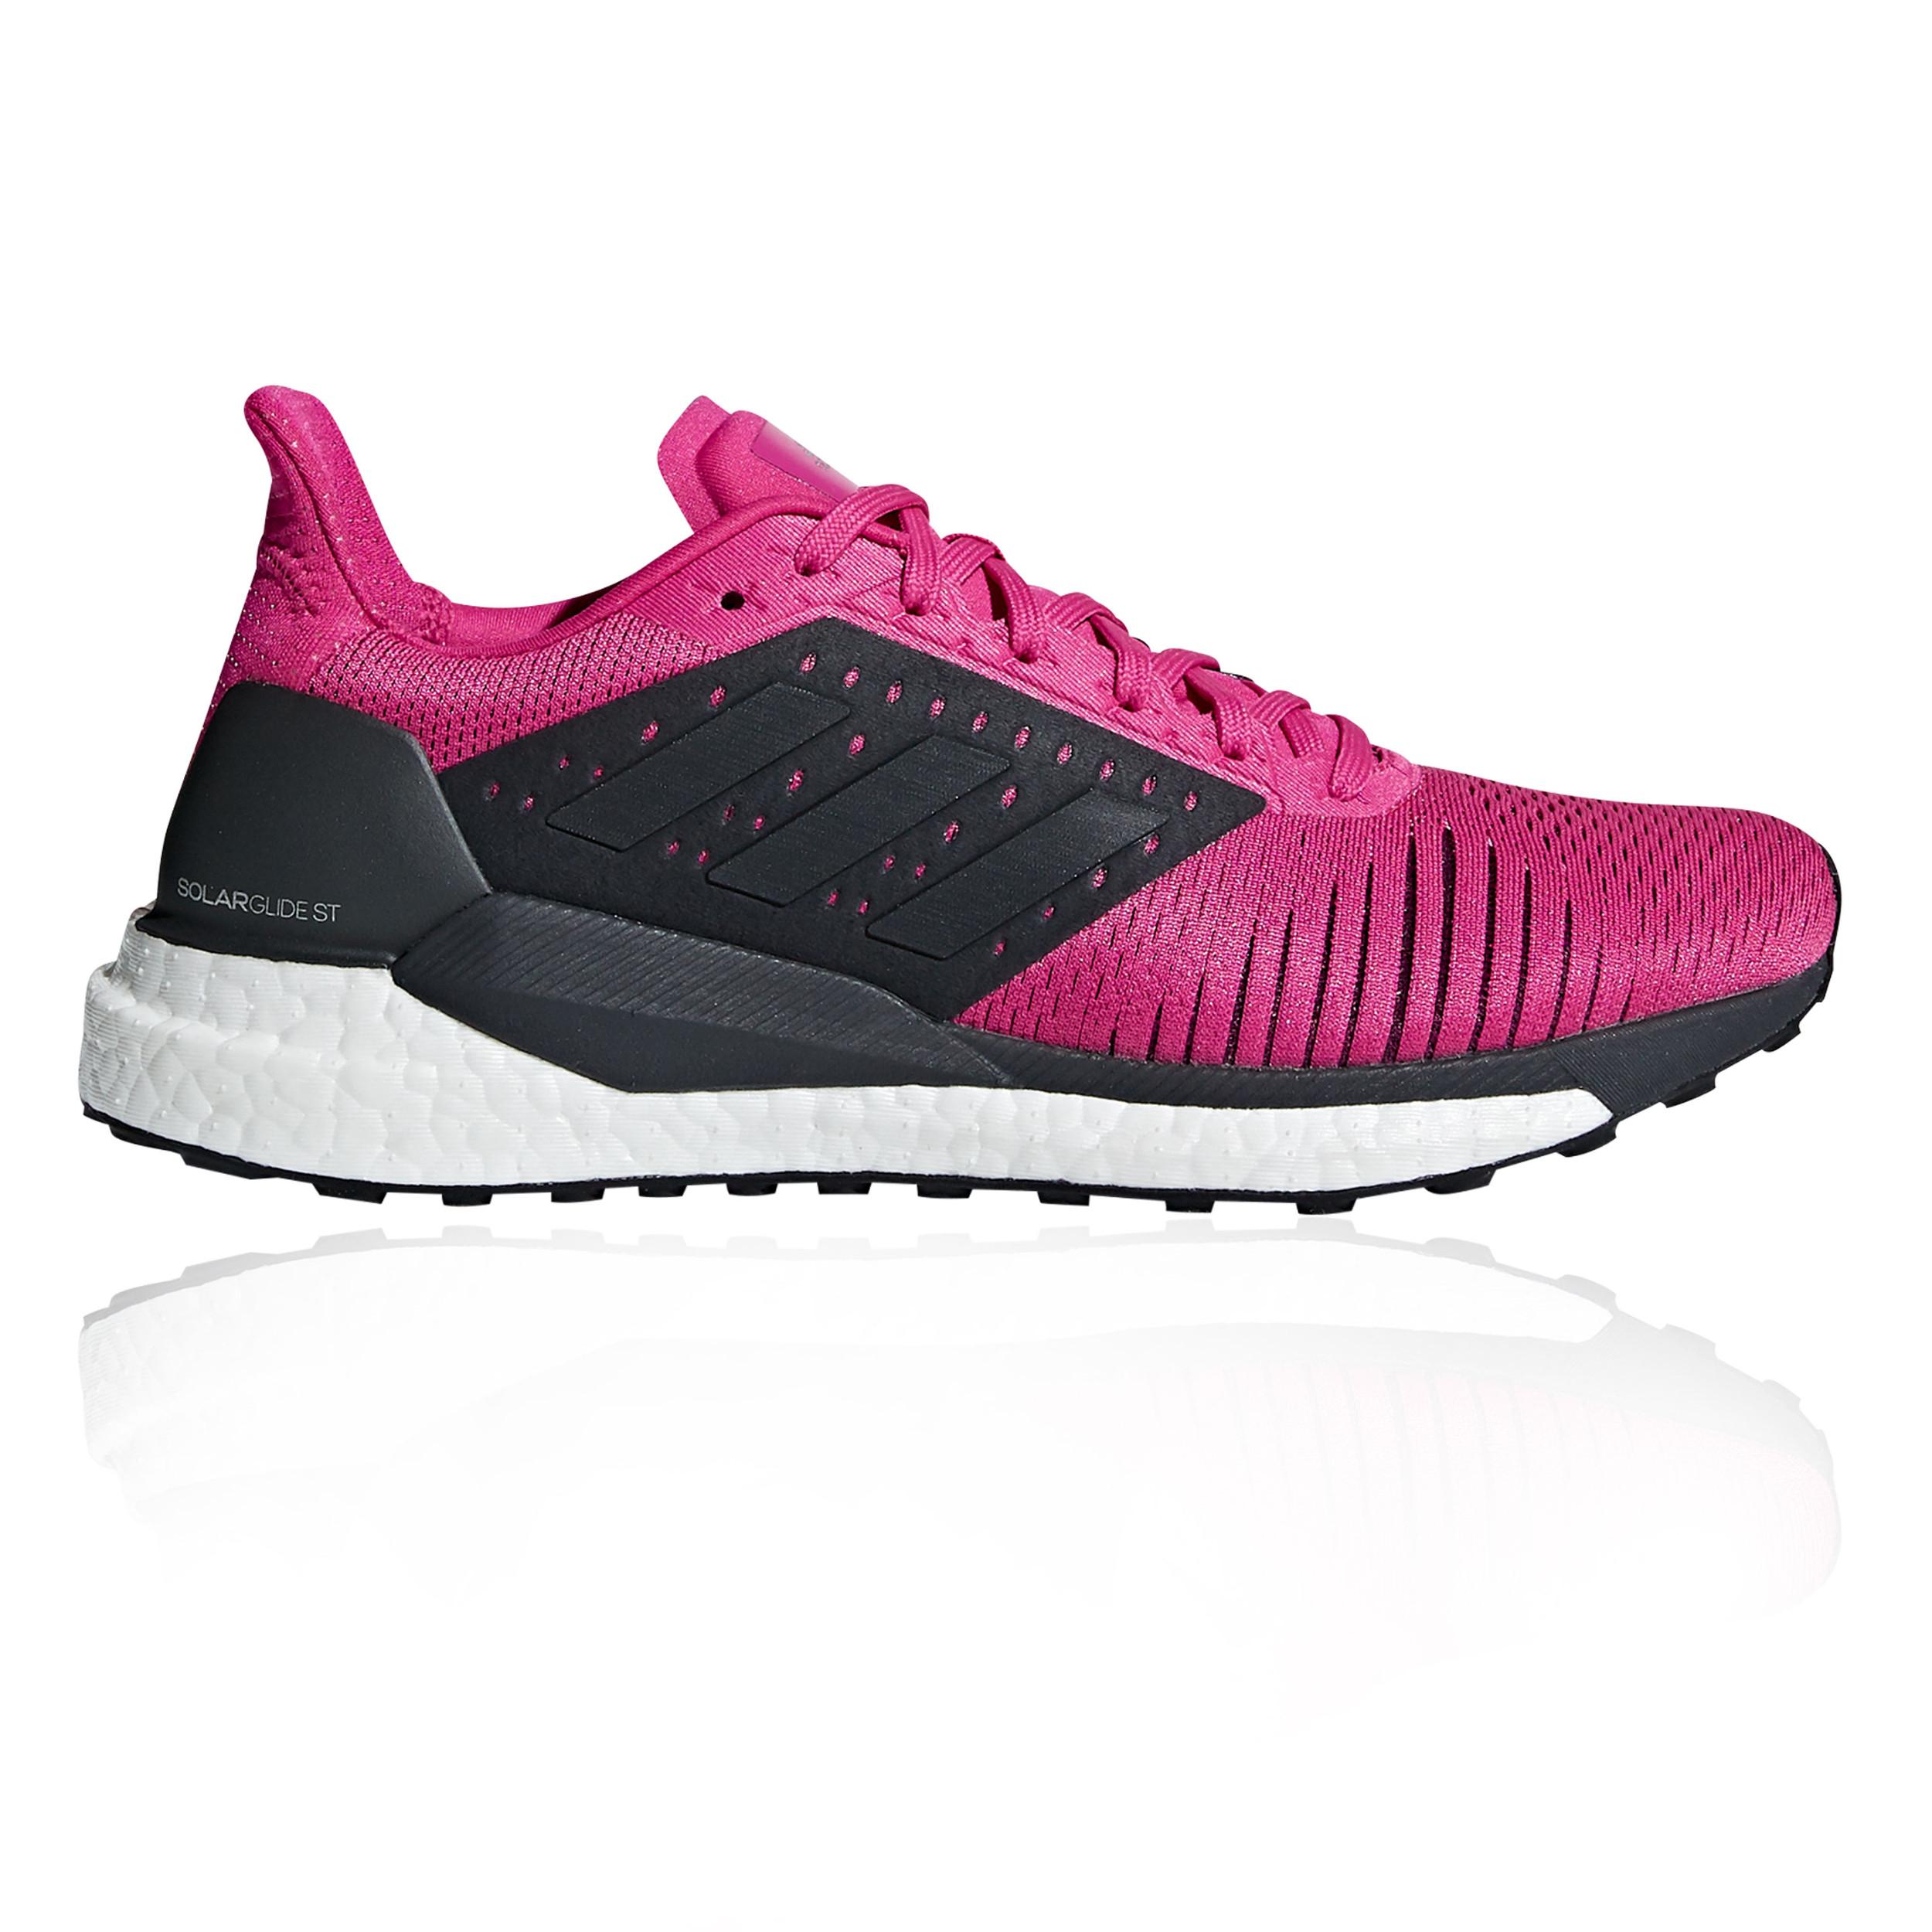 Chaussures Baskets Adidas Glide Course St Pied Solar Femmes À De vm8Nn0Ow